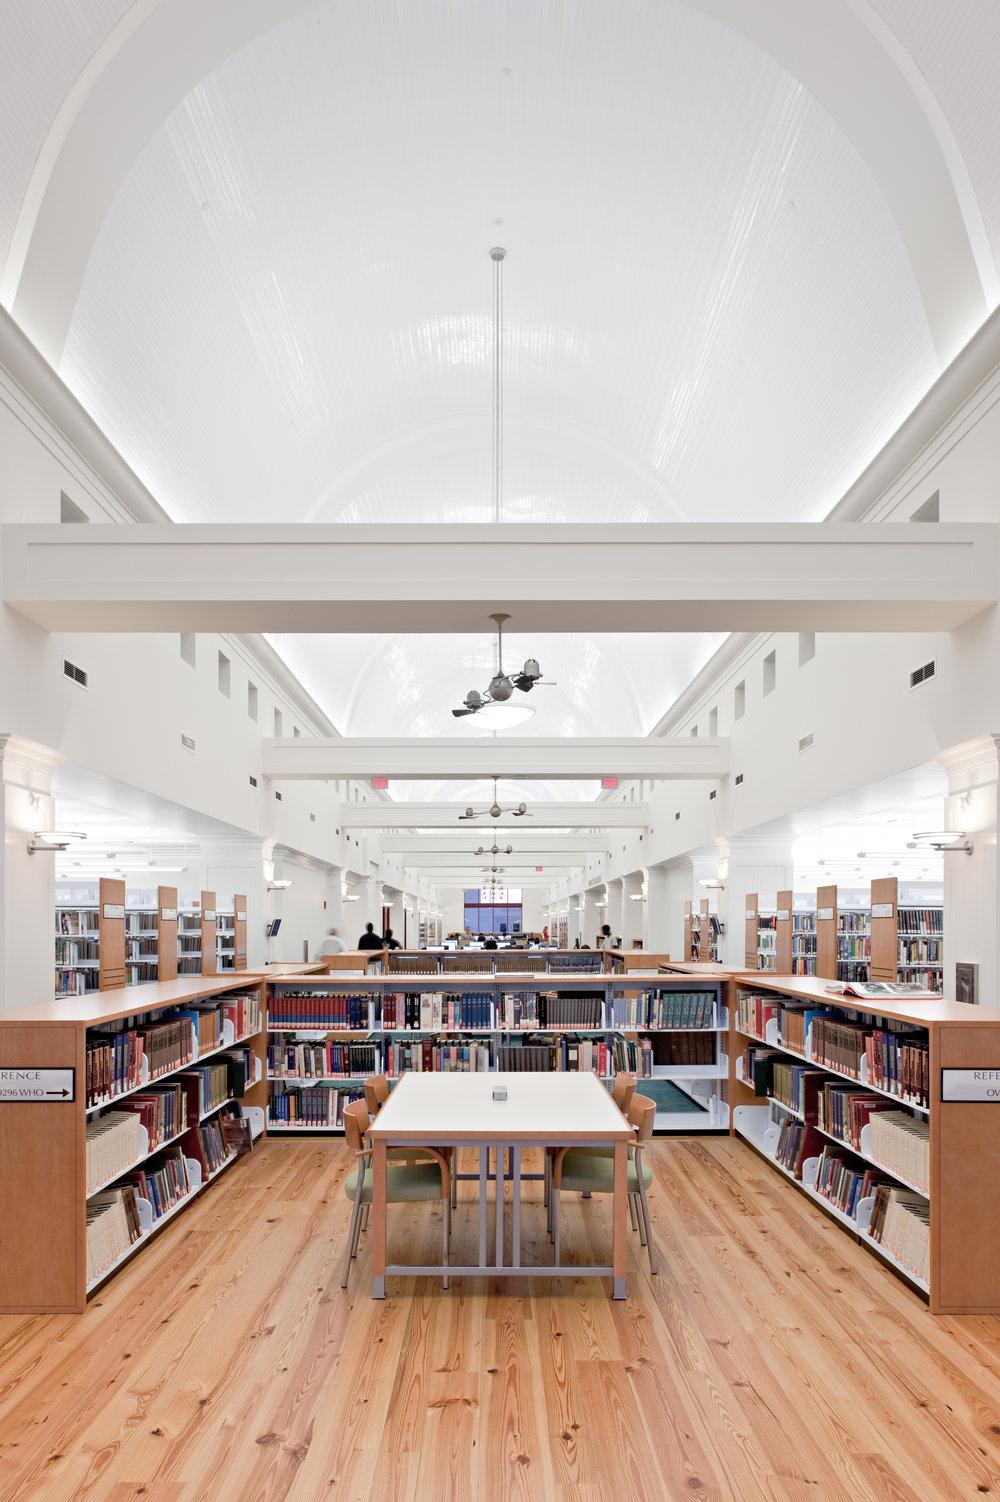 Library 4th Floor Library.jpg